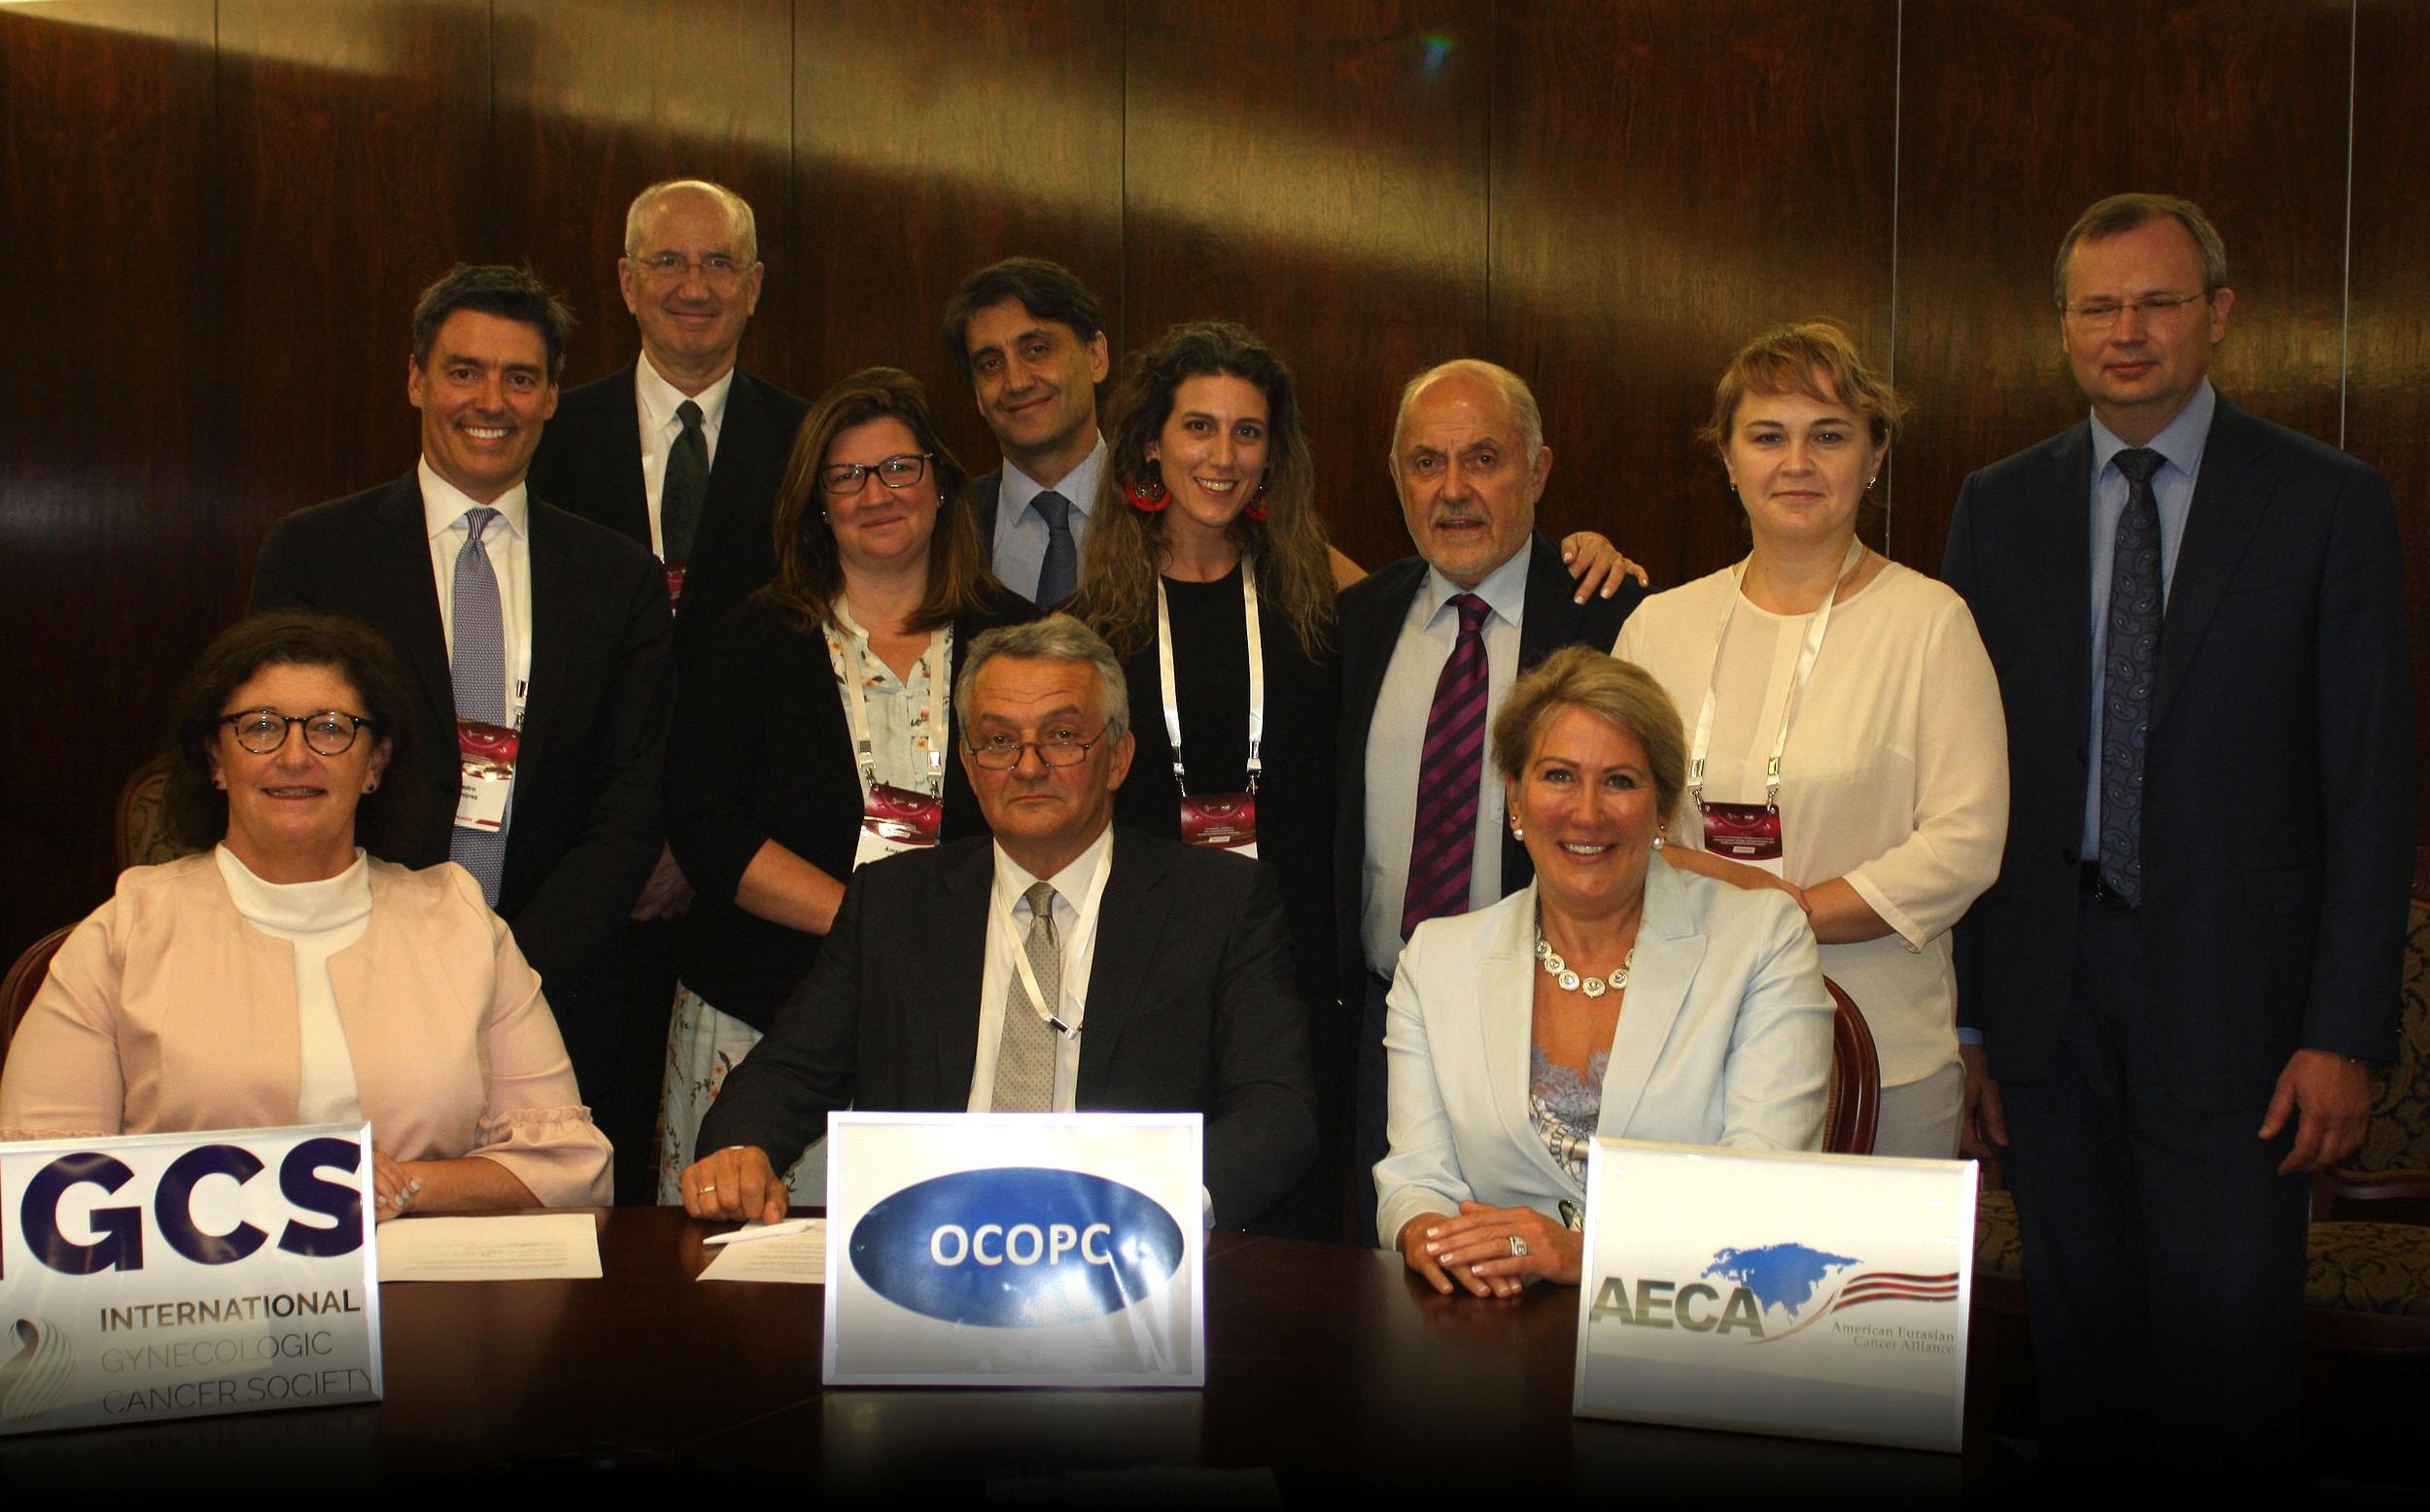 2019: Russia Joins the IGCS Strategic Alliance Partnership Program